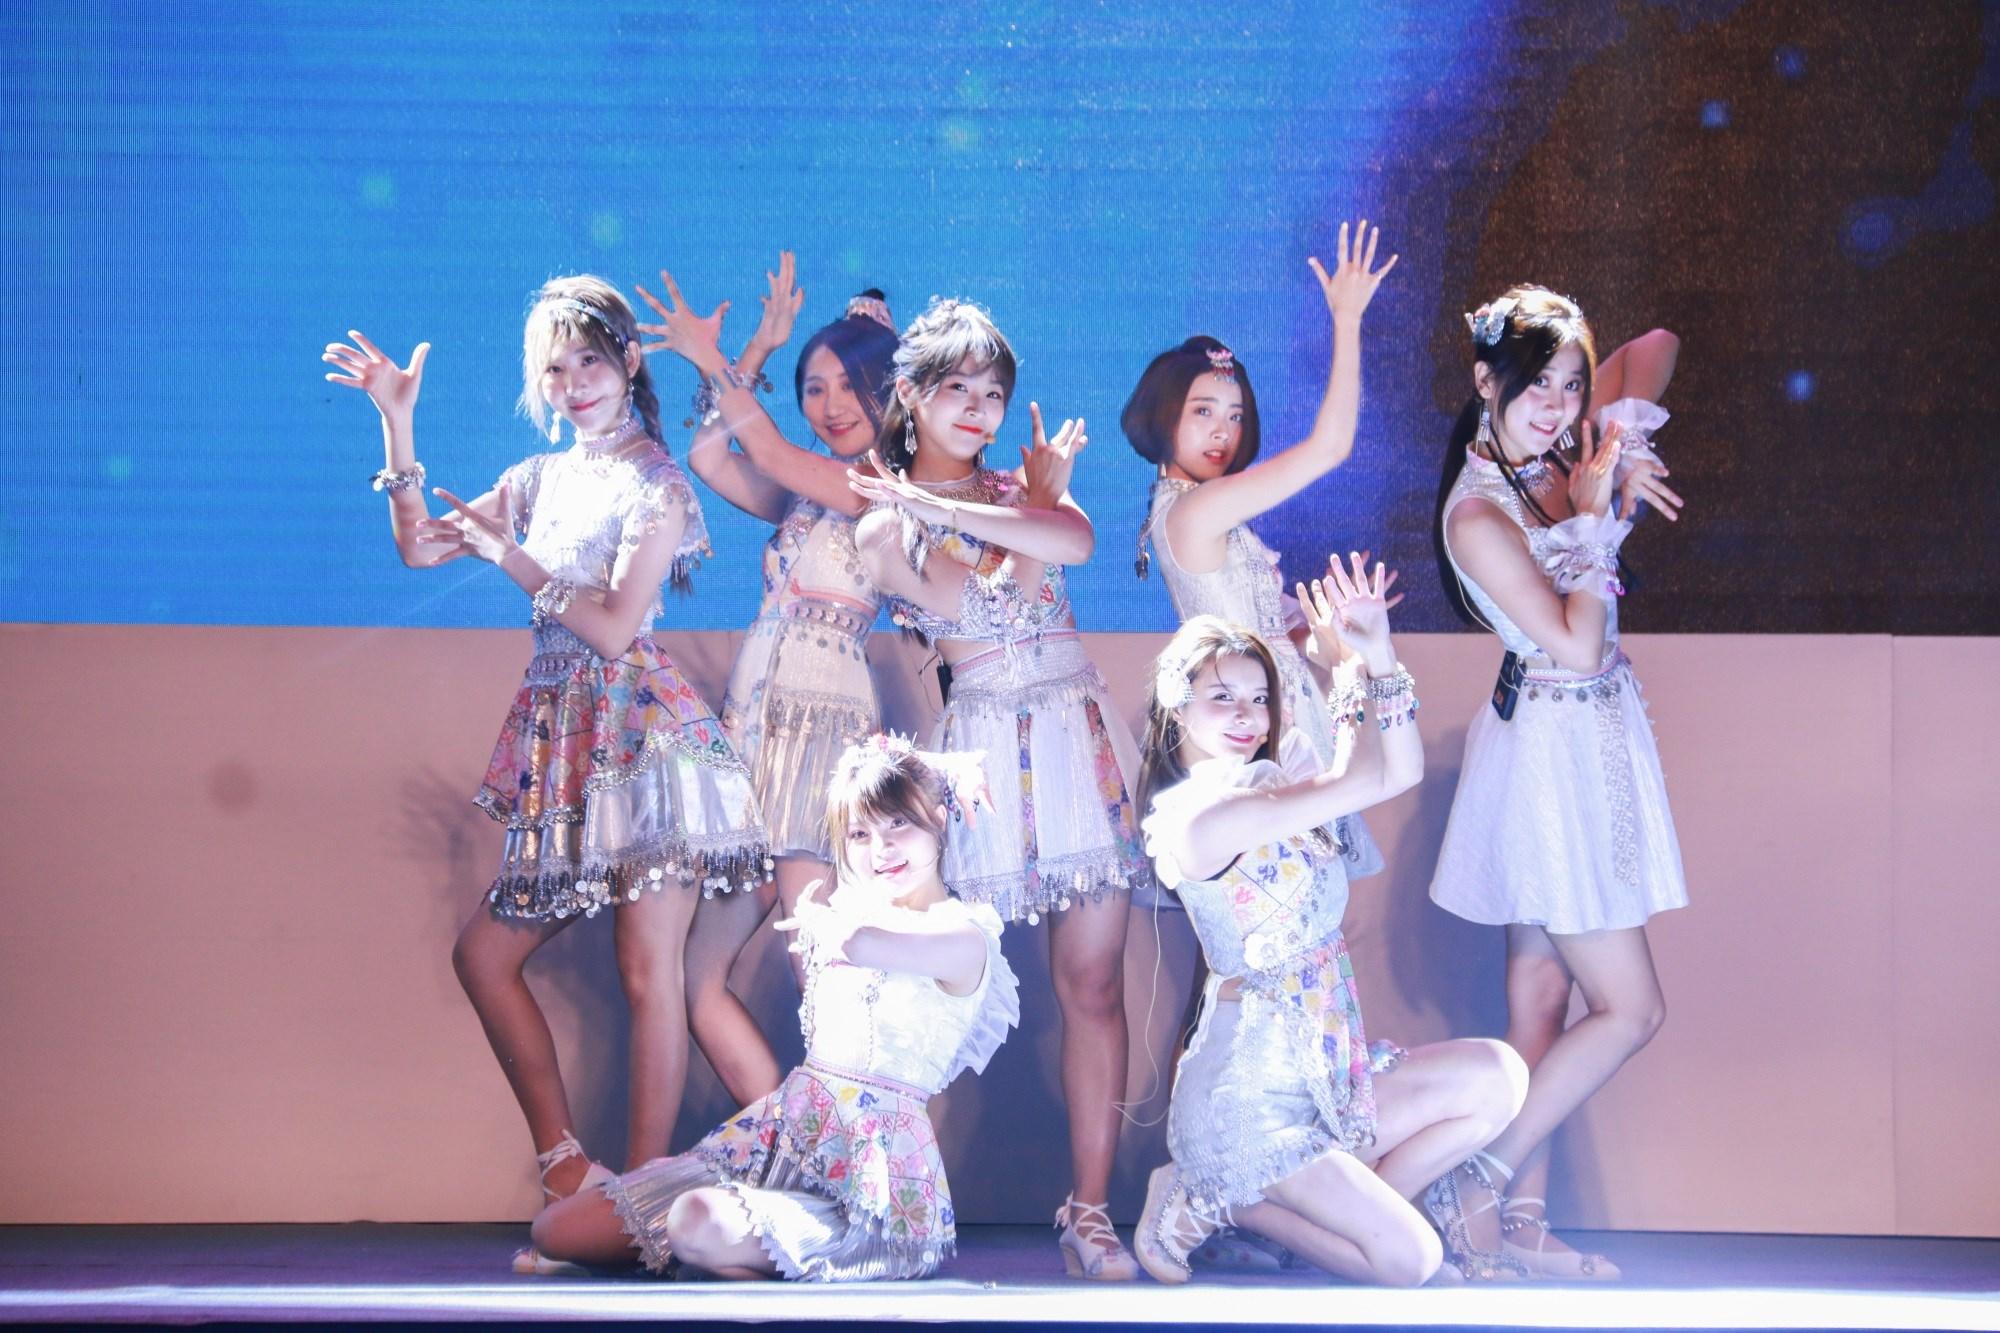 SING女团《夜笙歌》亮相国际舞台 电子国风惊艳世界